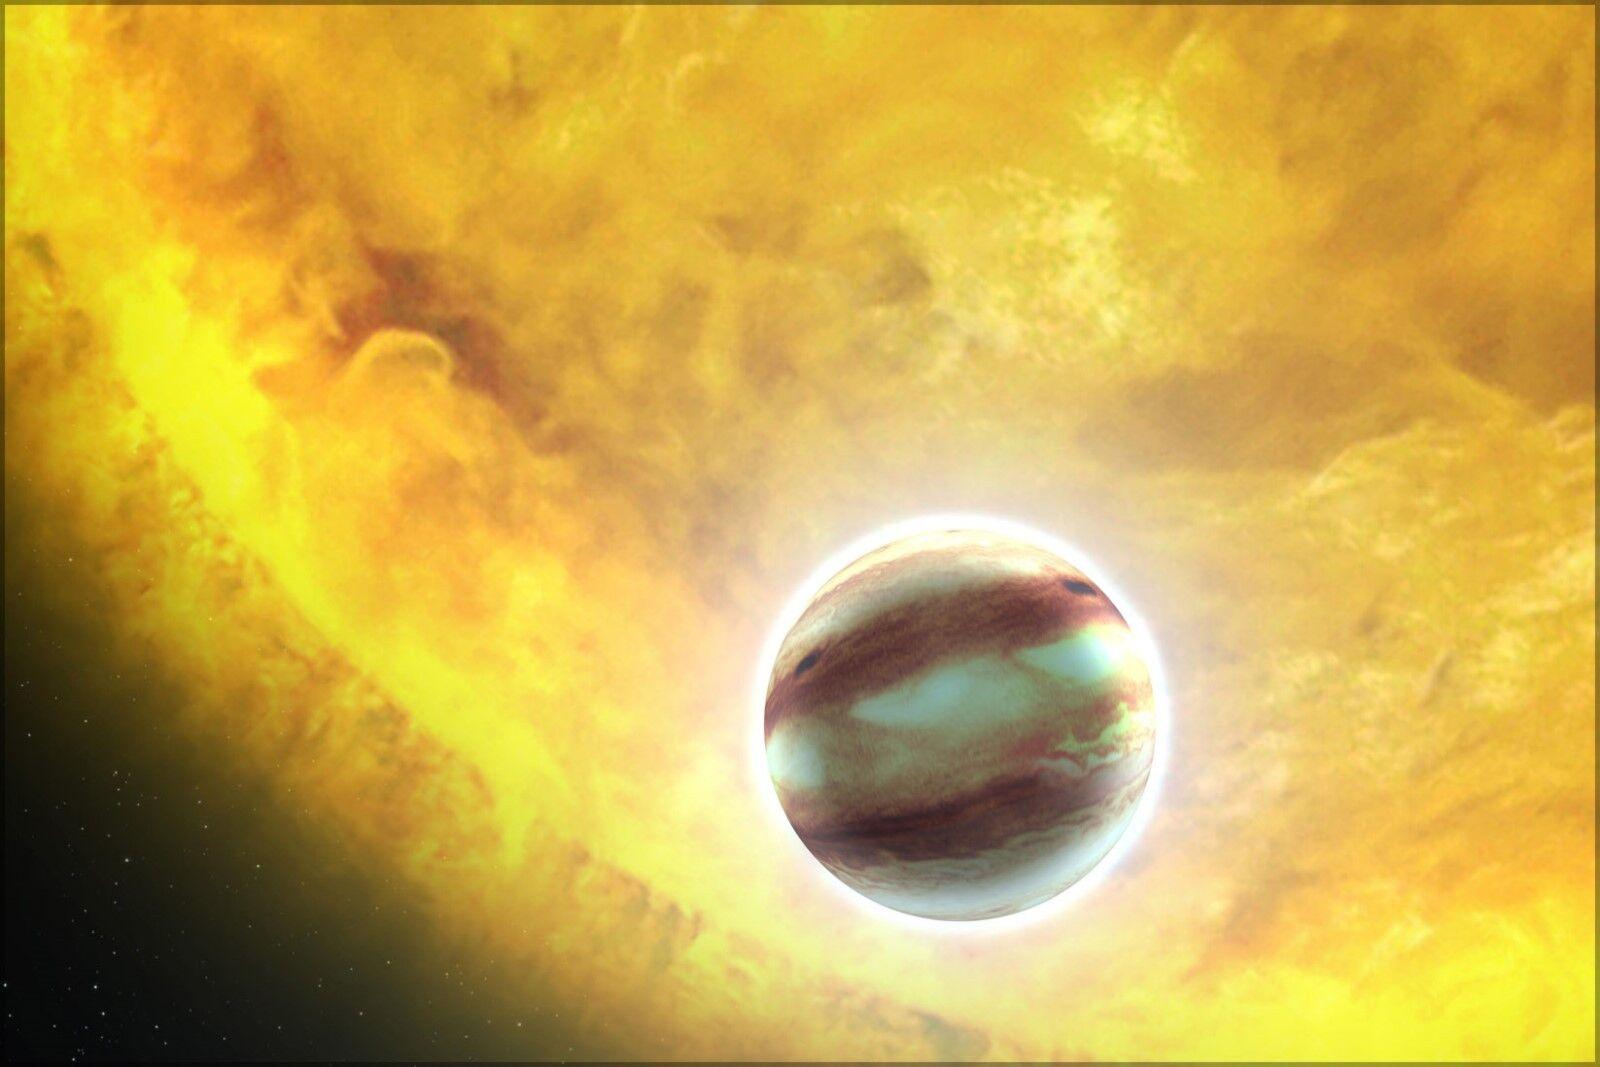 Poster, Many Größes; Concept Of Planet Hat-P-7B A Hot Jupiter Class Planet